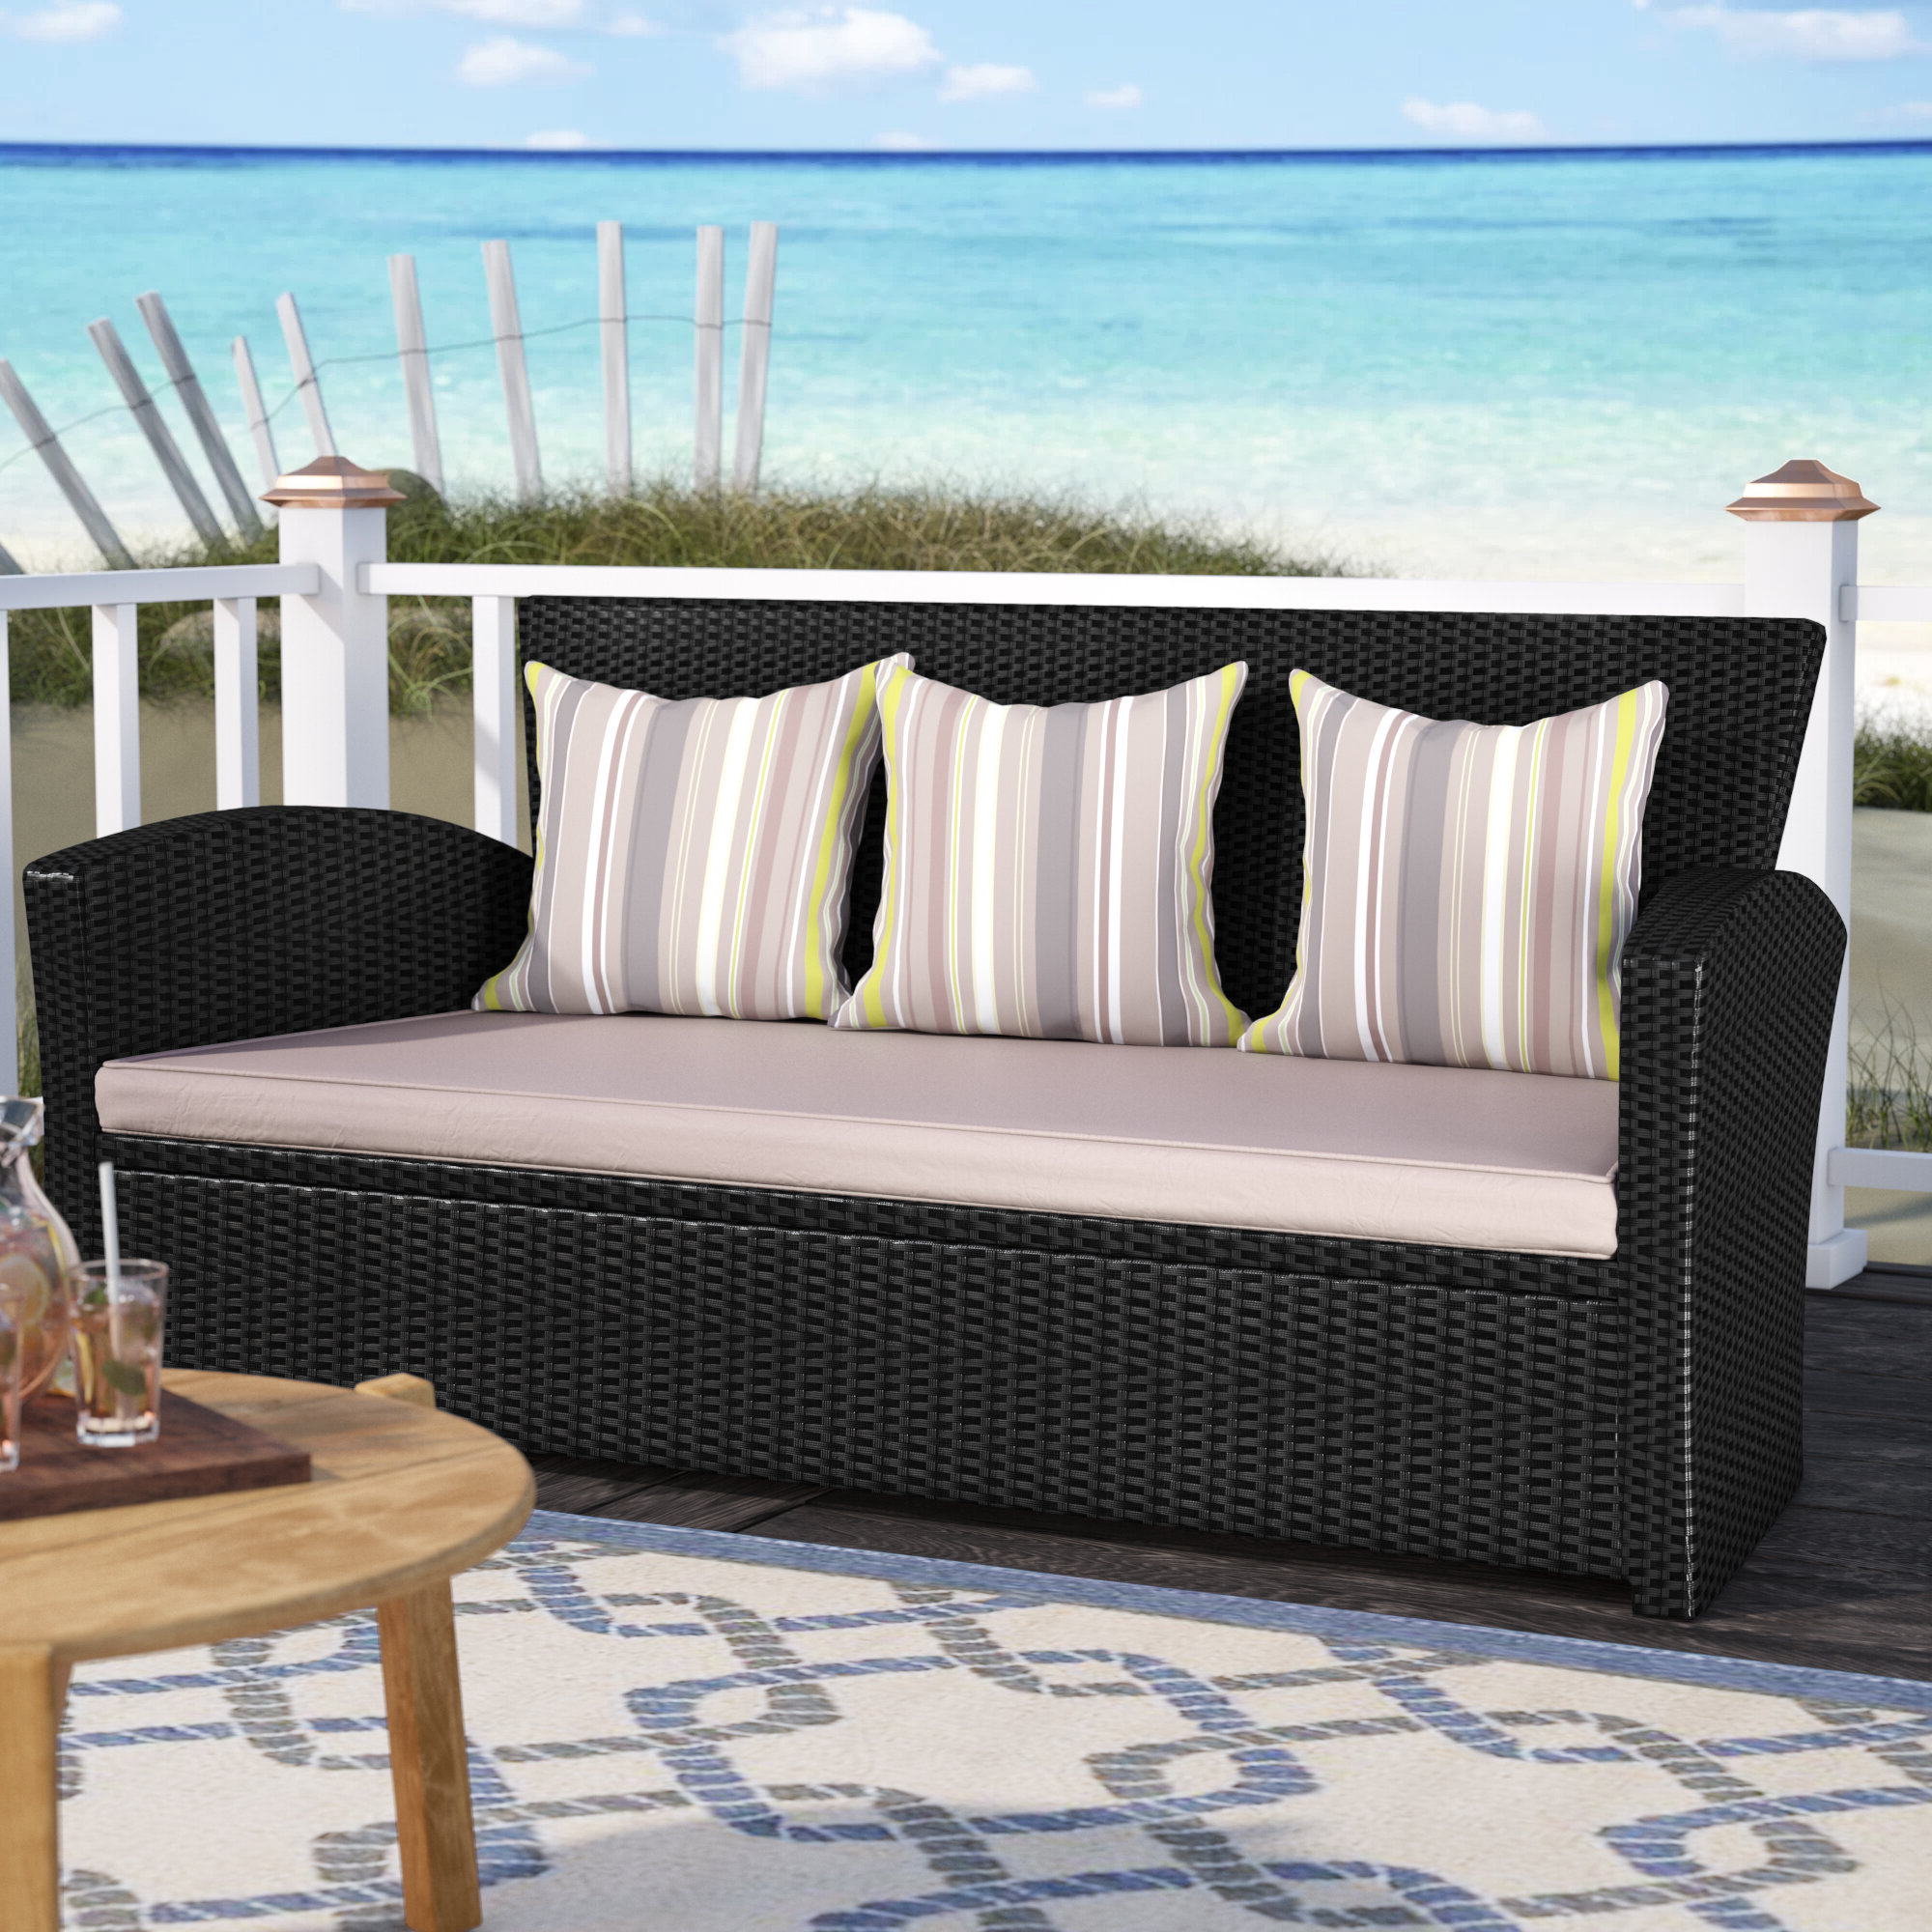 Fashionable Valetta Patio Sofa With Cushions Inside Katzer Patio Sofas With Cushions (View 7 of 20)